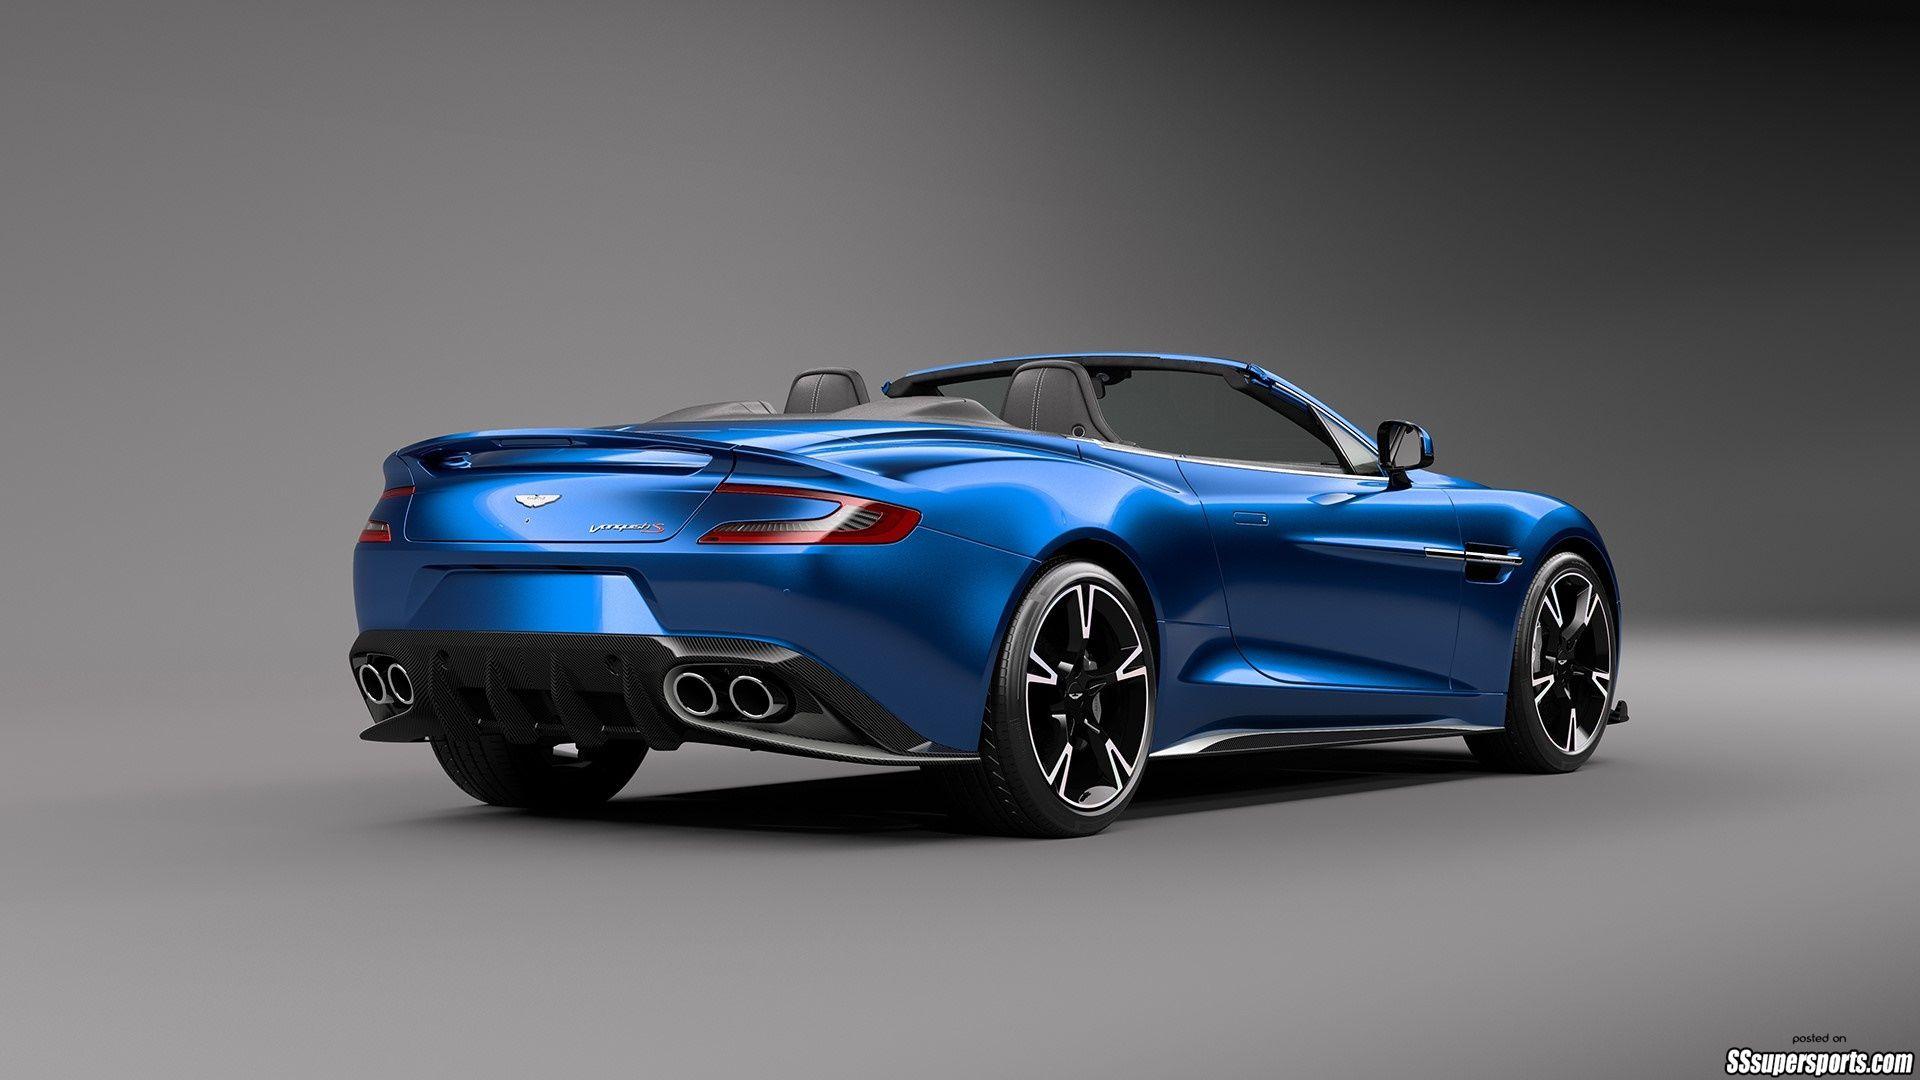 2 2018 Aston Martin Vanquish S Volante Rear Side View